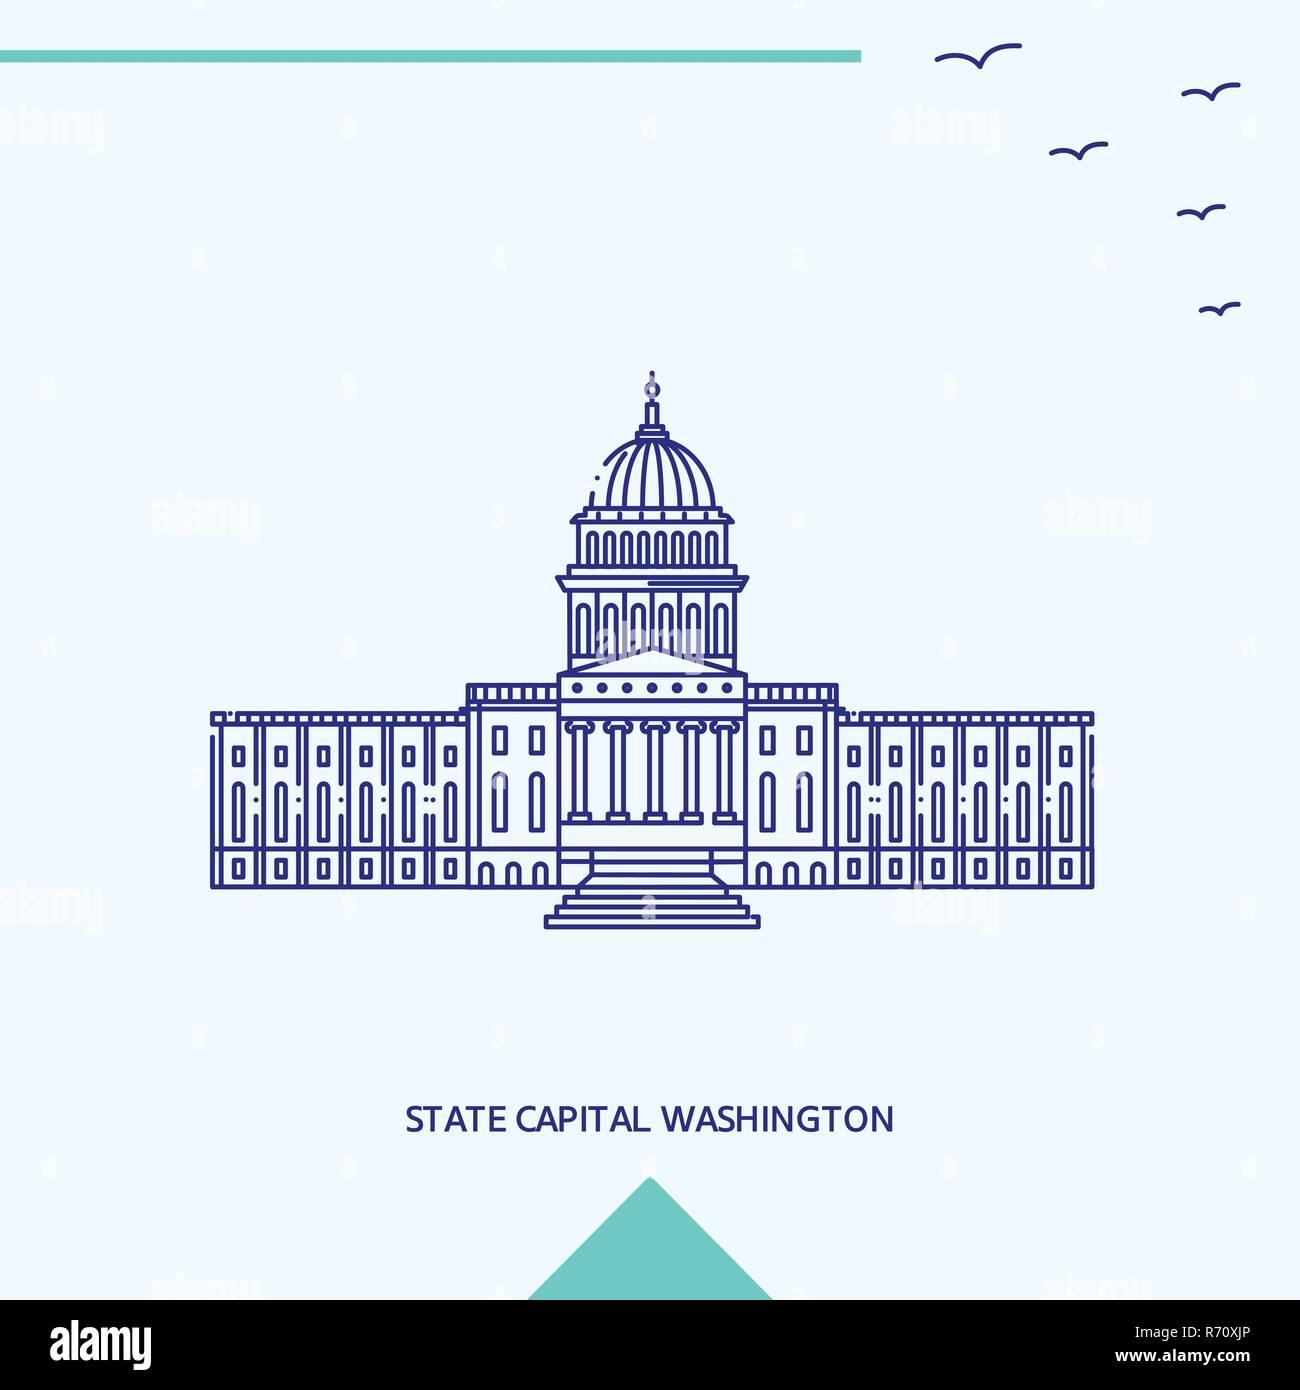 STATE CAPITAL WASHINGTON skyline vector illustration - Stock Vector